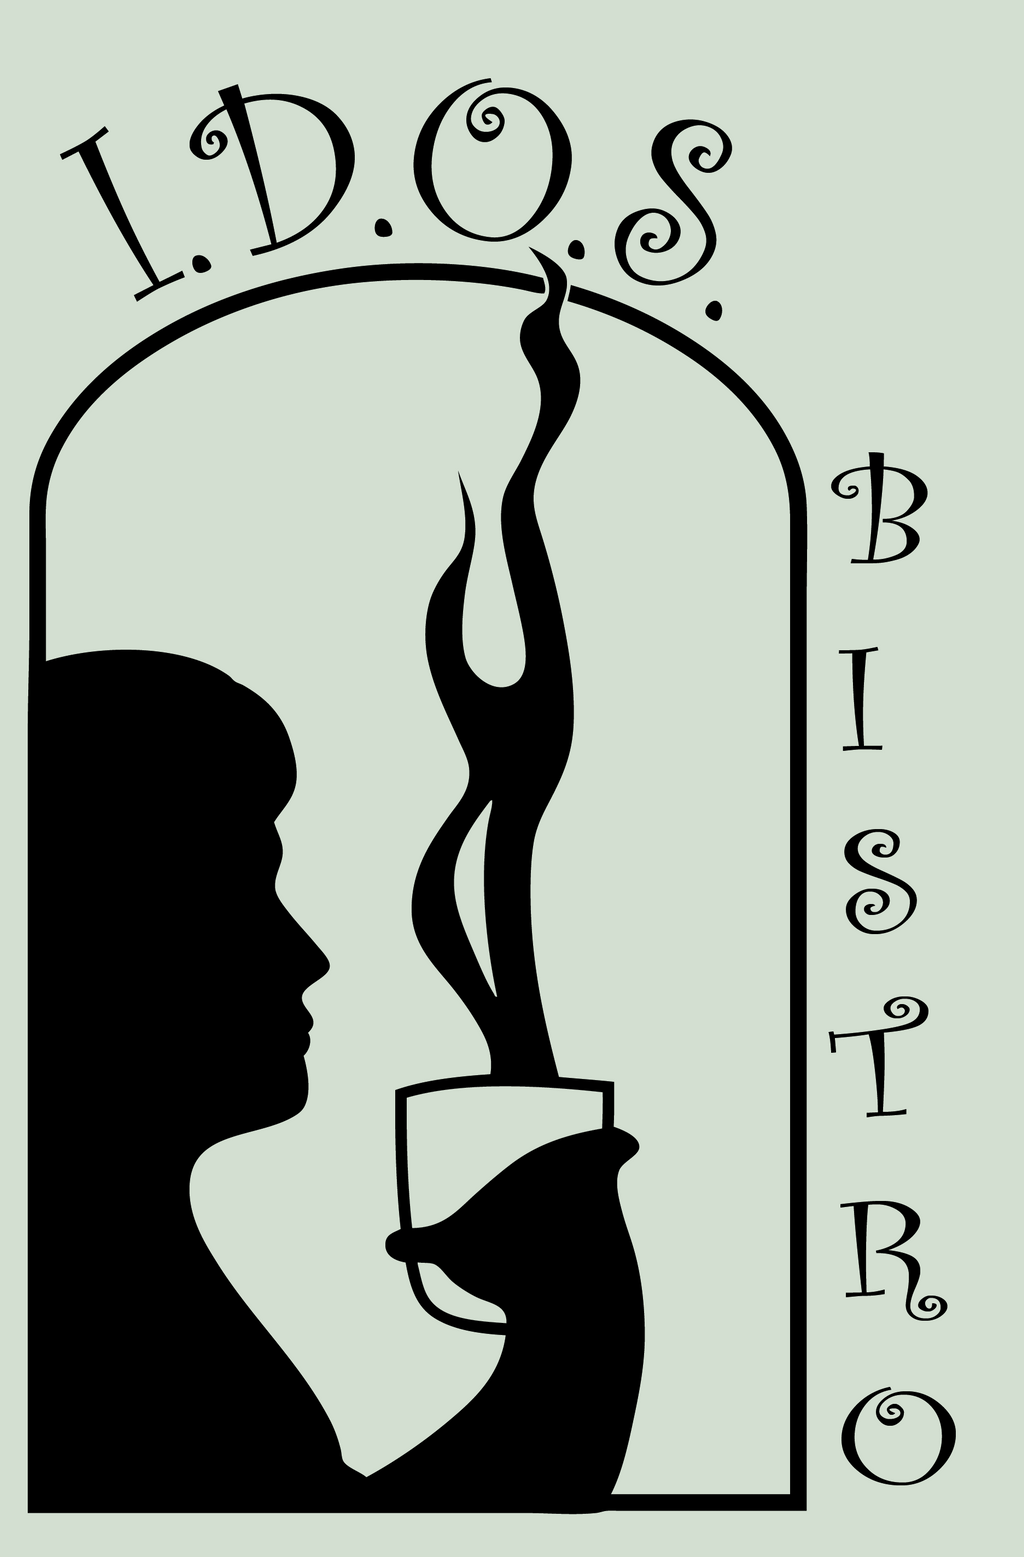 Coffee Shop Logo Png Coffee Shop Logo Final by